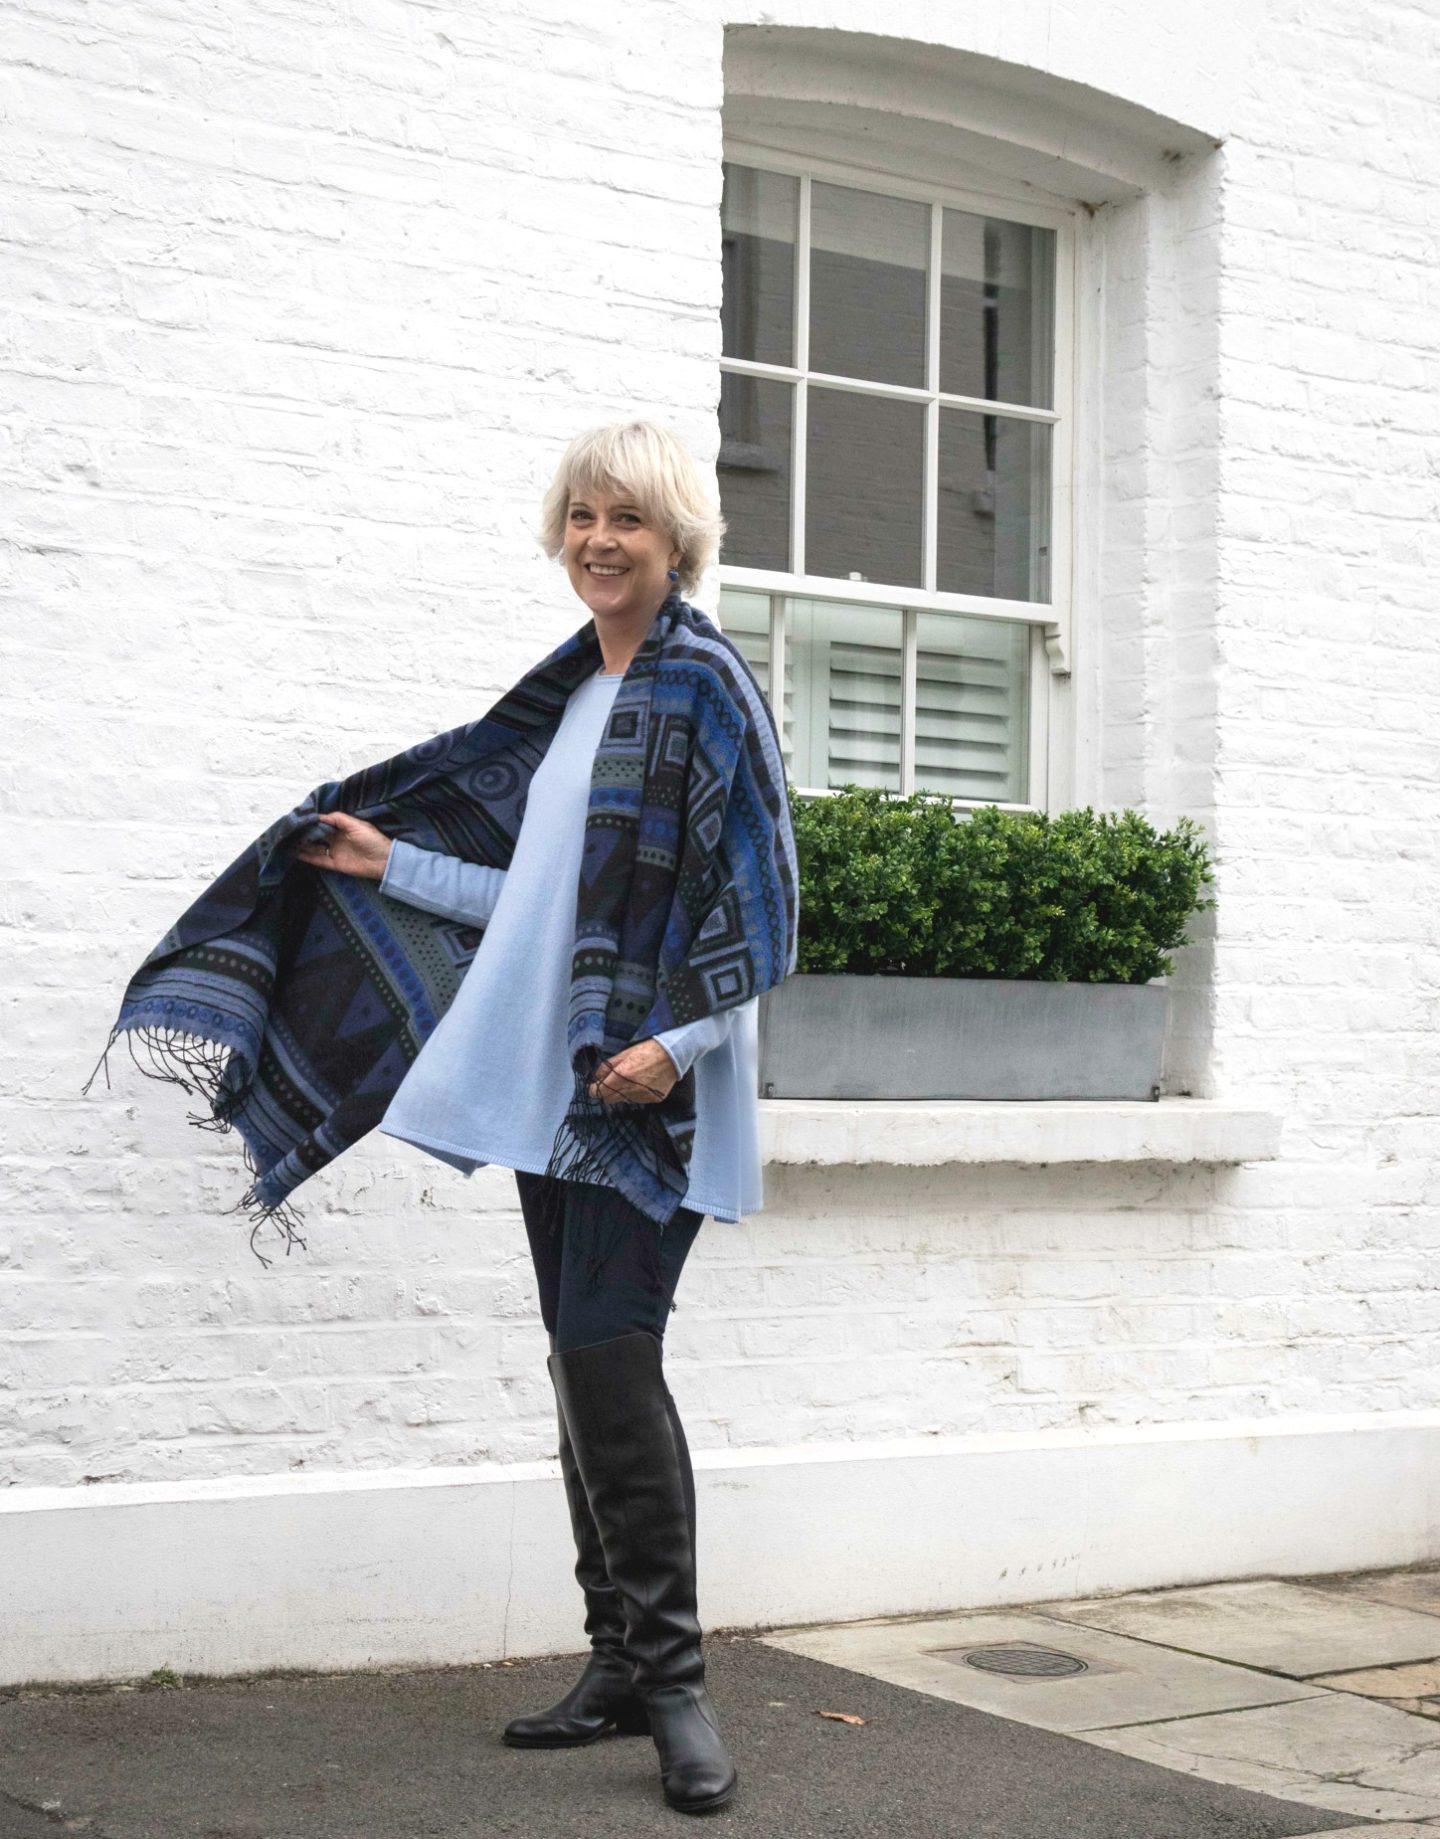 WoolOvers knitwear giveaway